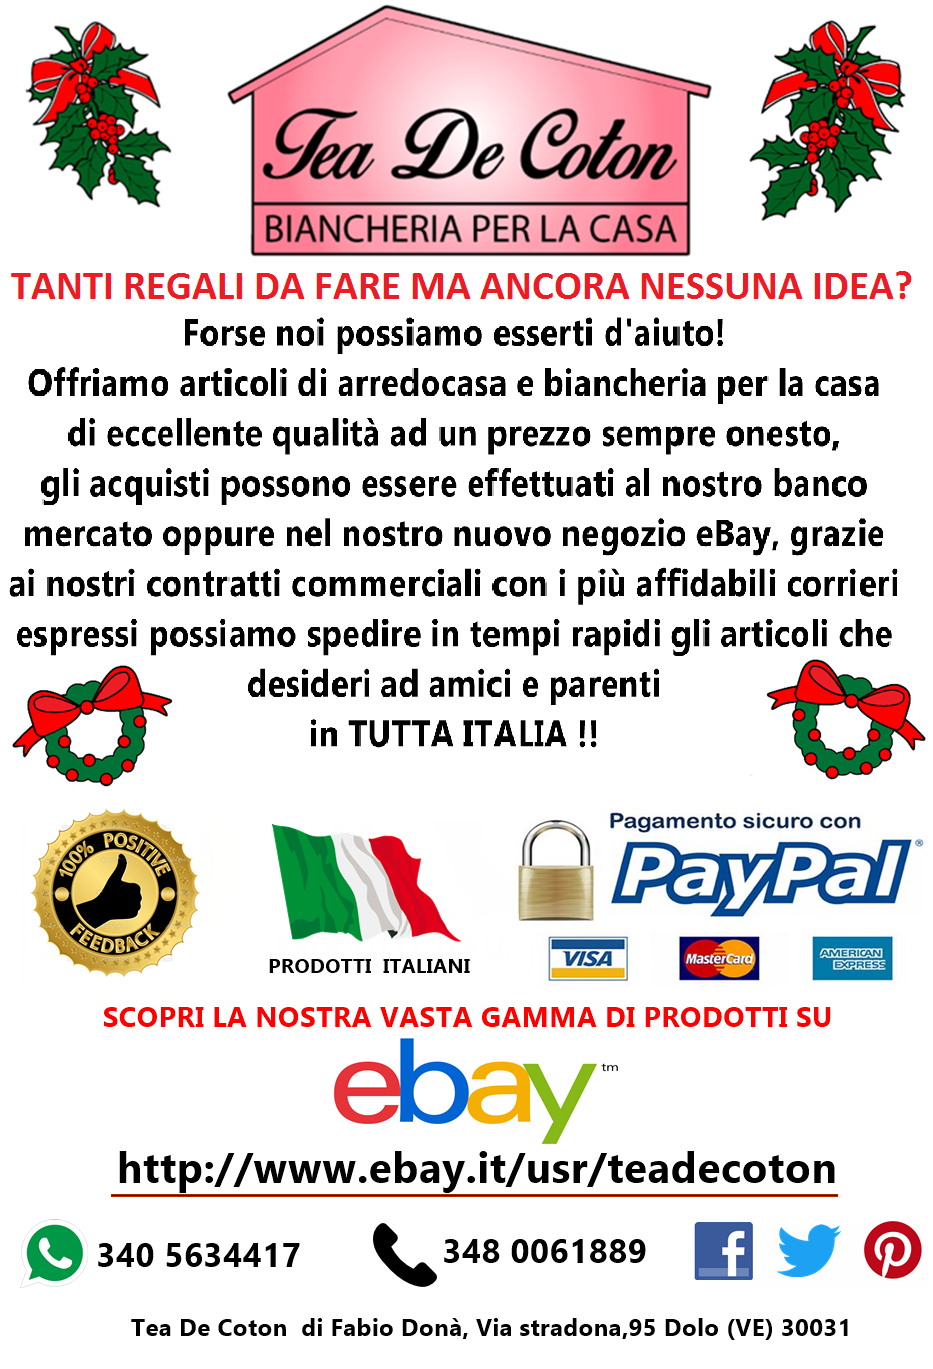 AL NEGOZIO==>http://www.ebay.it/usr/teadecoton